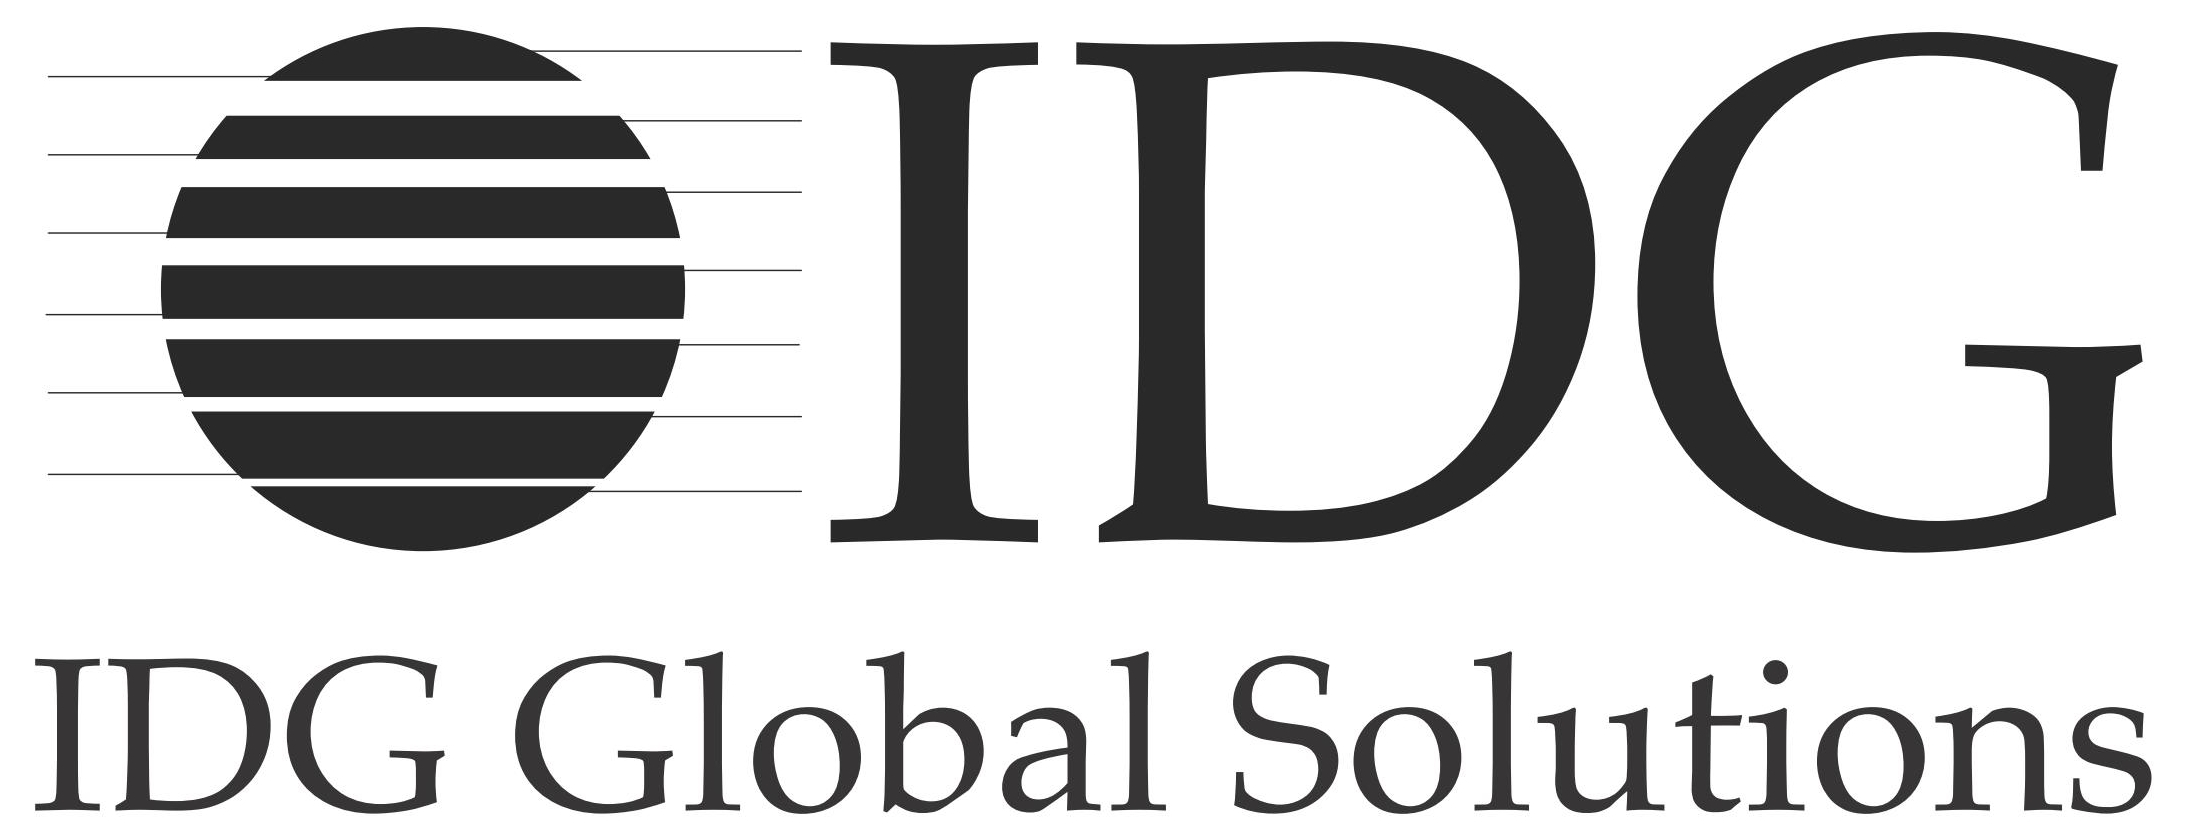 International Data Group Idg Logo - Ar International, Transparent background PNG HD thumbnail